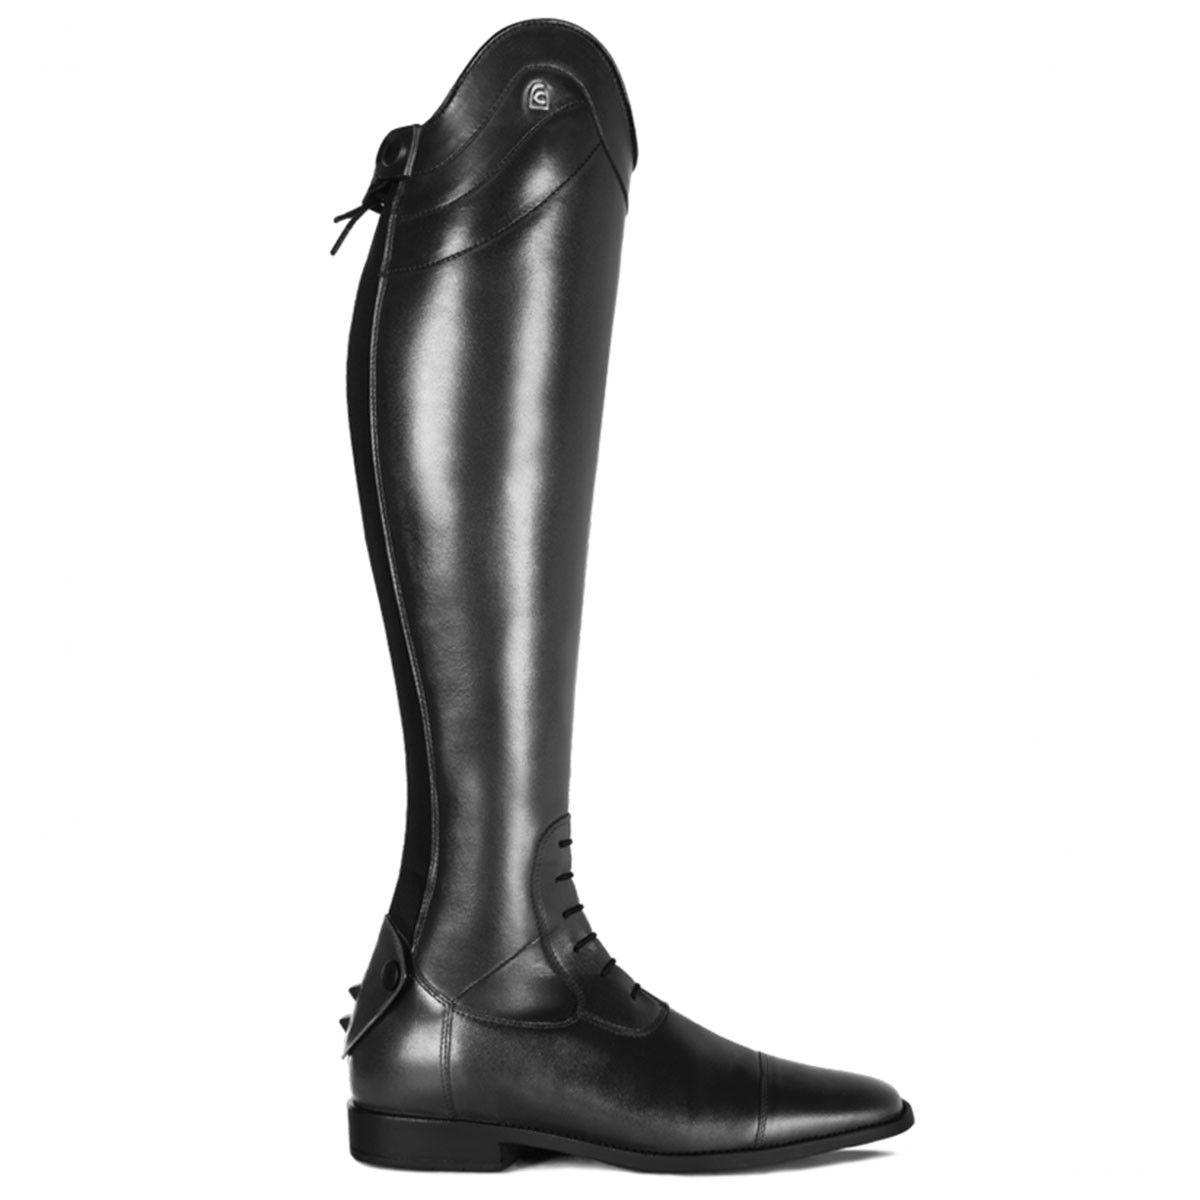 Cavallo Linus Slim rijlaars zwart maat:7-7.5 / h52-w37